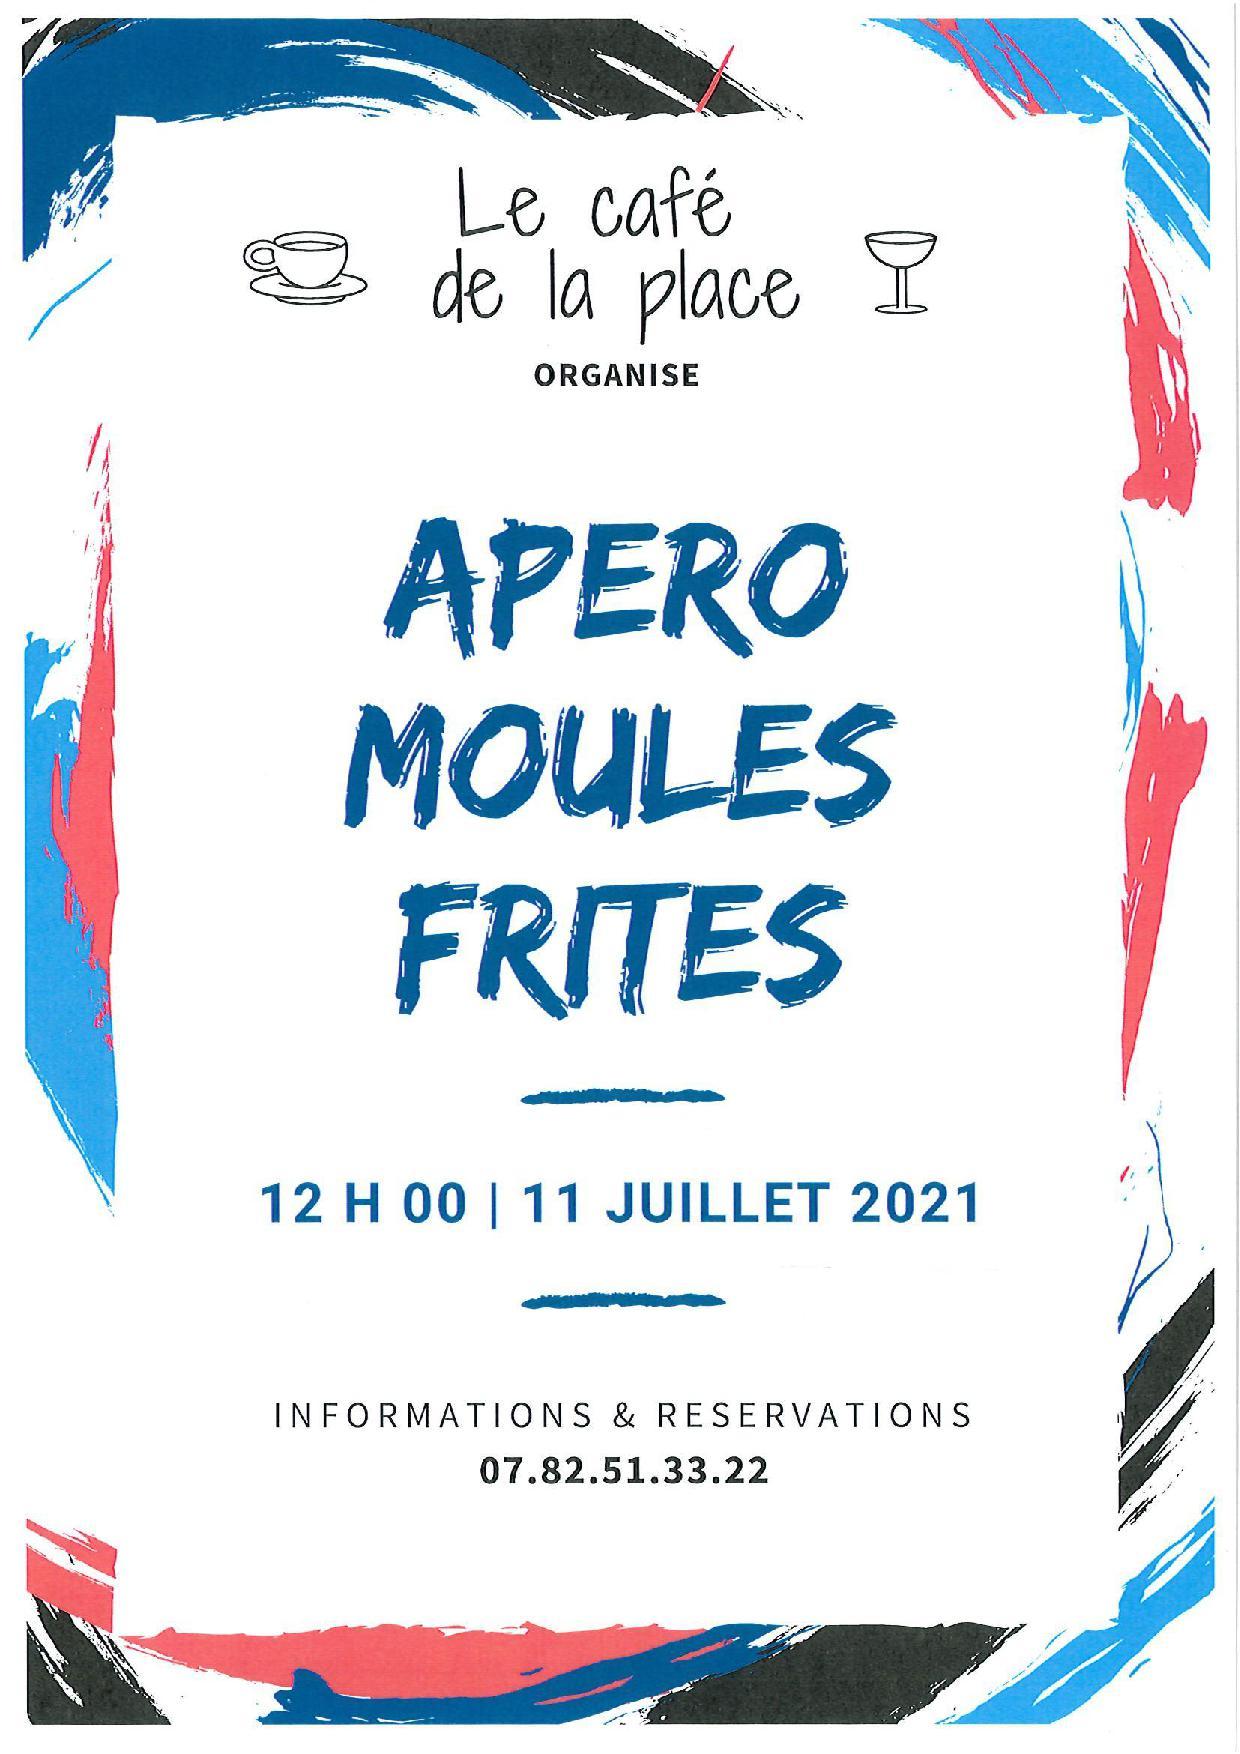 APERO MOULES FRITES 11 JUILLET 2021